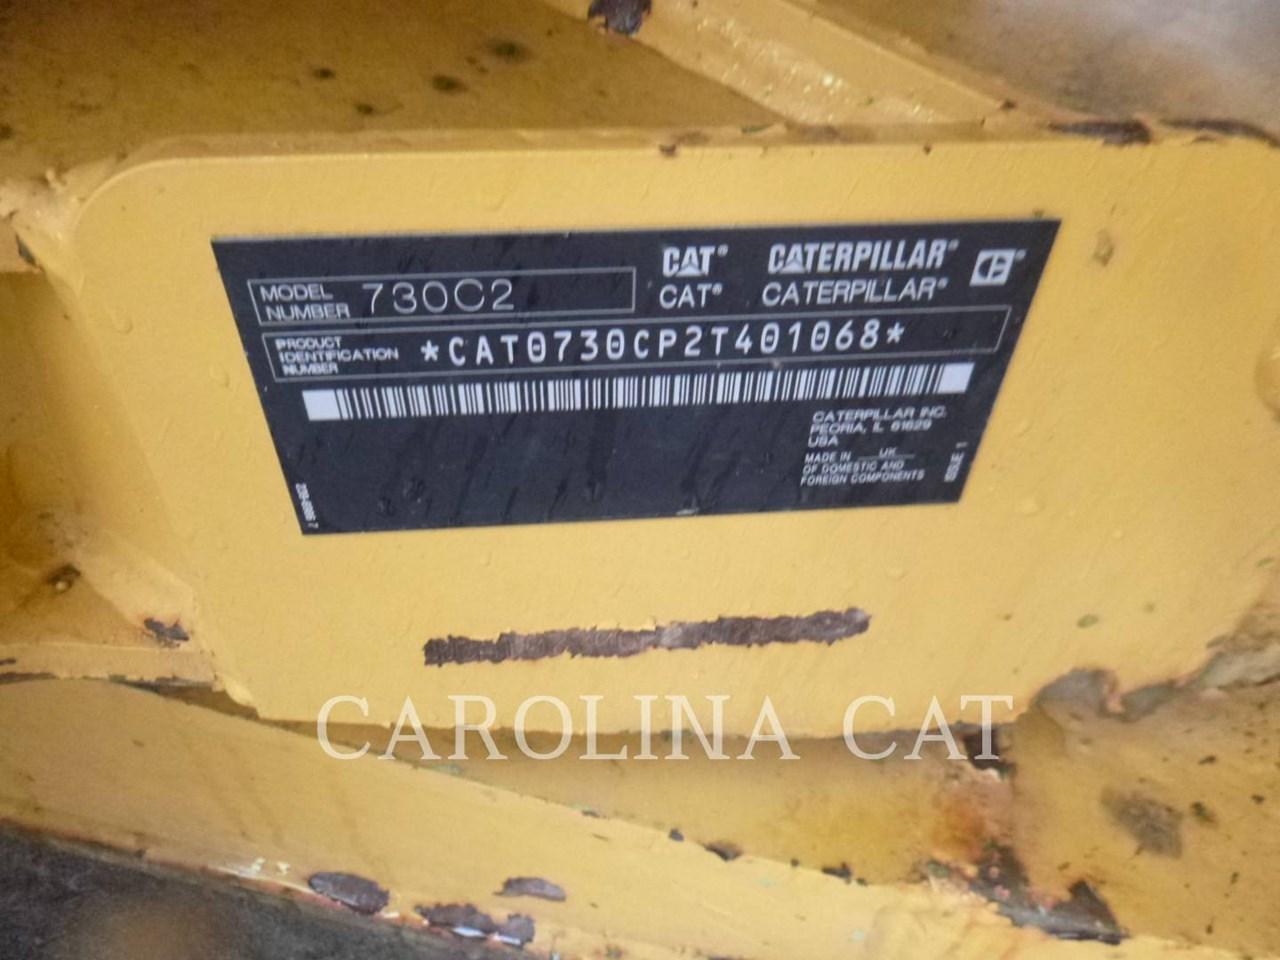 2018 Caterpillar 730C2 TG Image 6